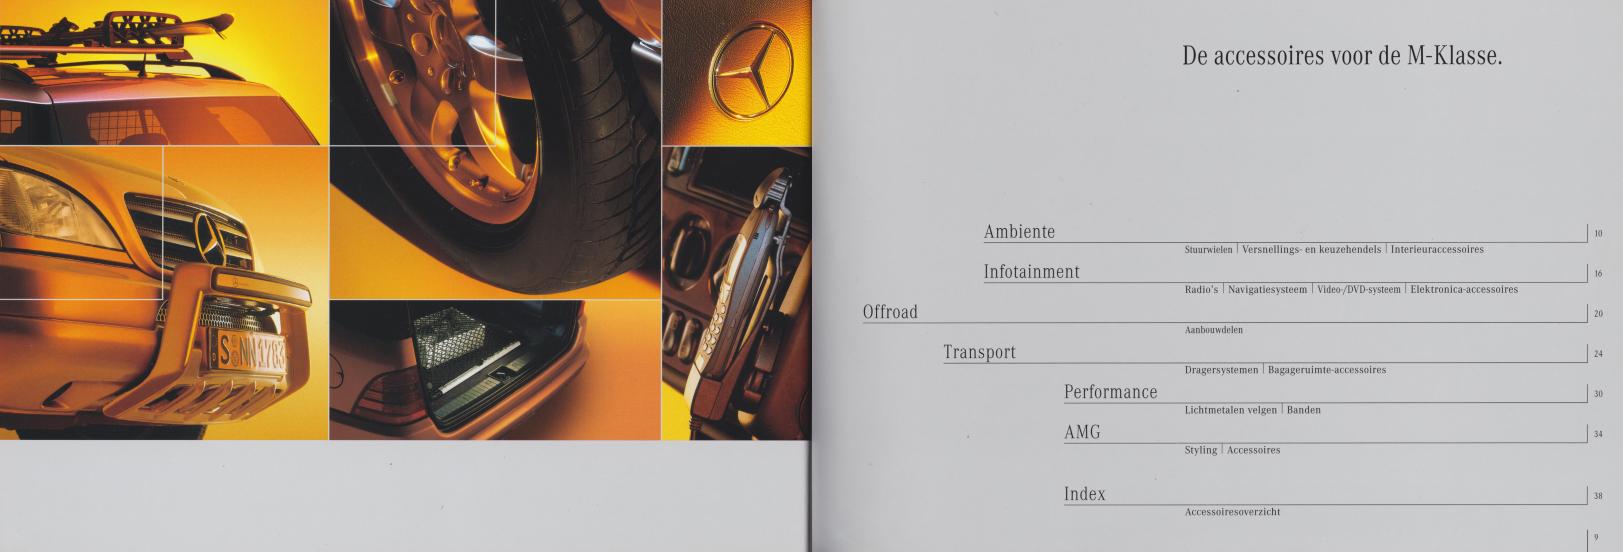 (W163): Catálogo 2001 - acessórios - neerlandês 005